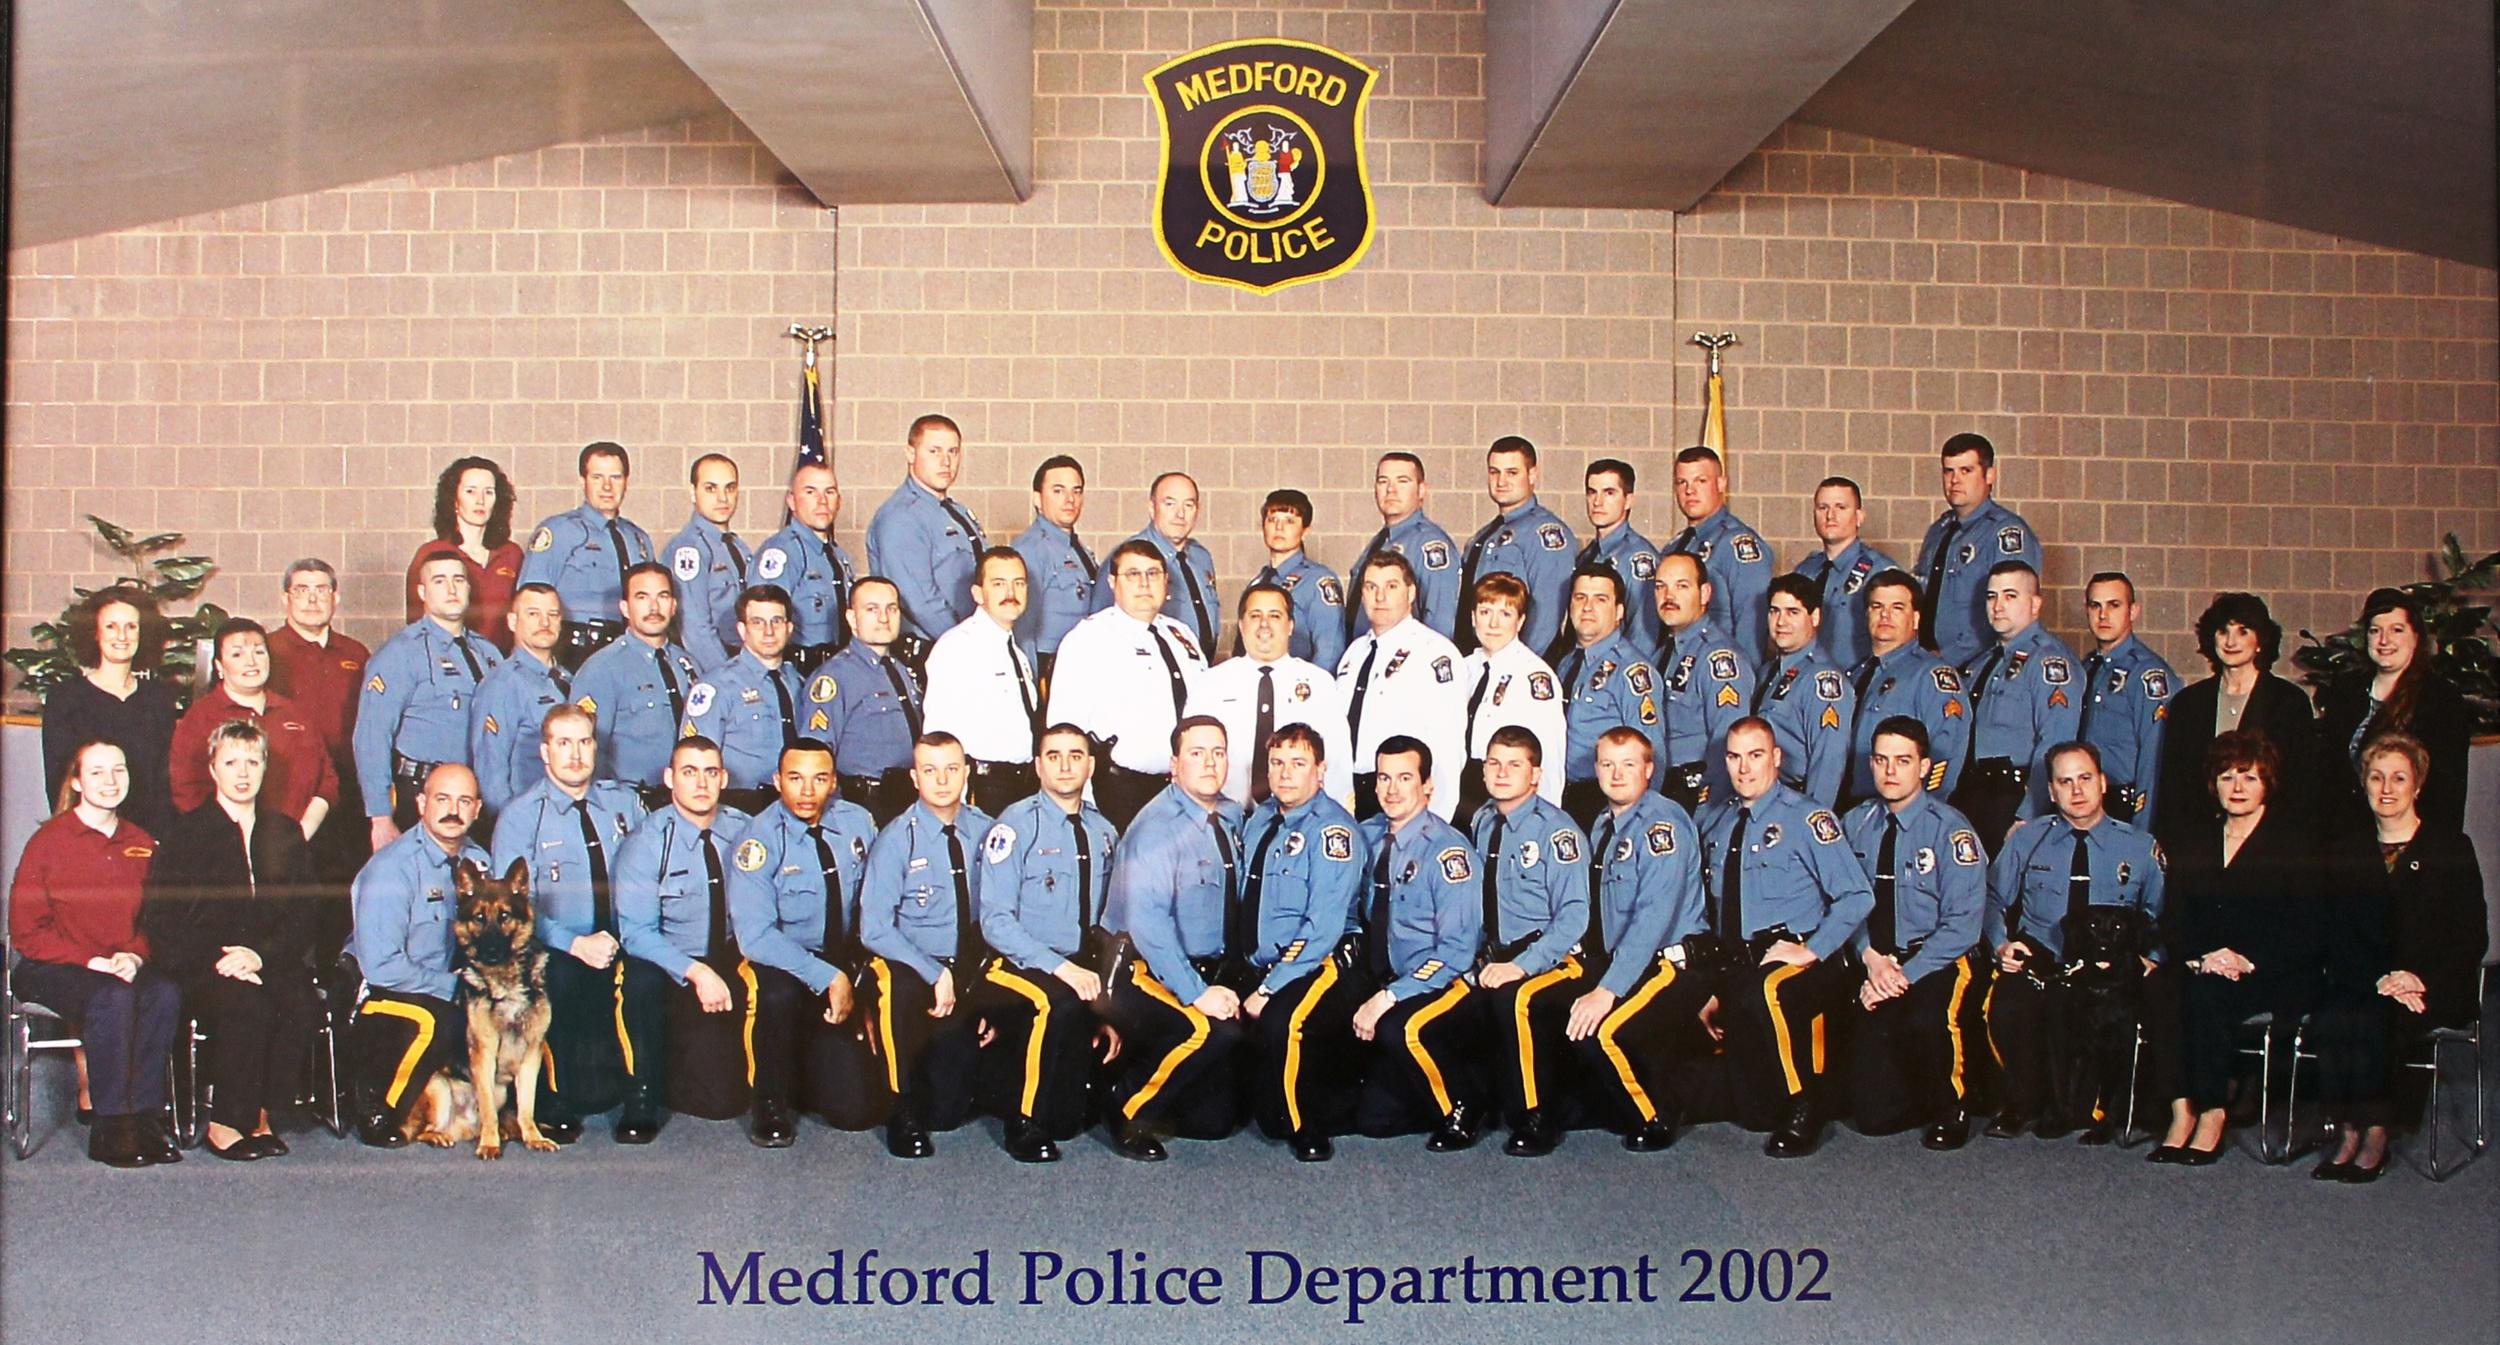 2002 Department Photo